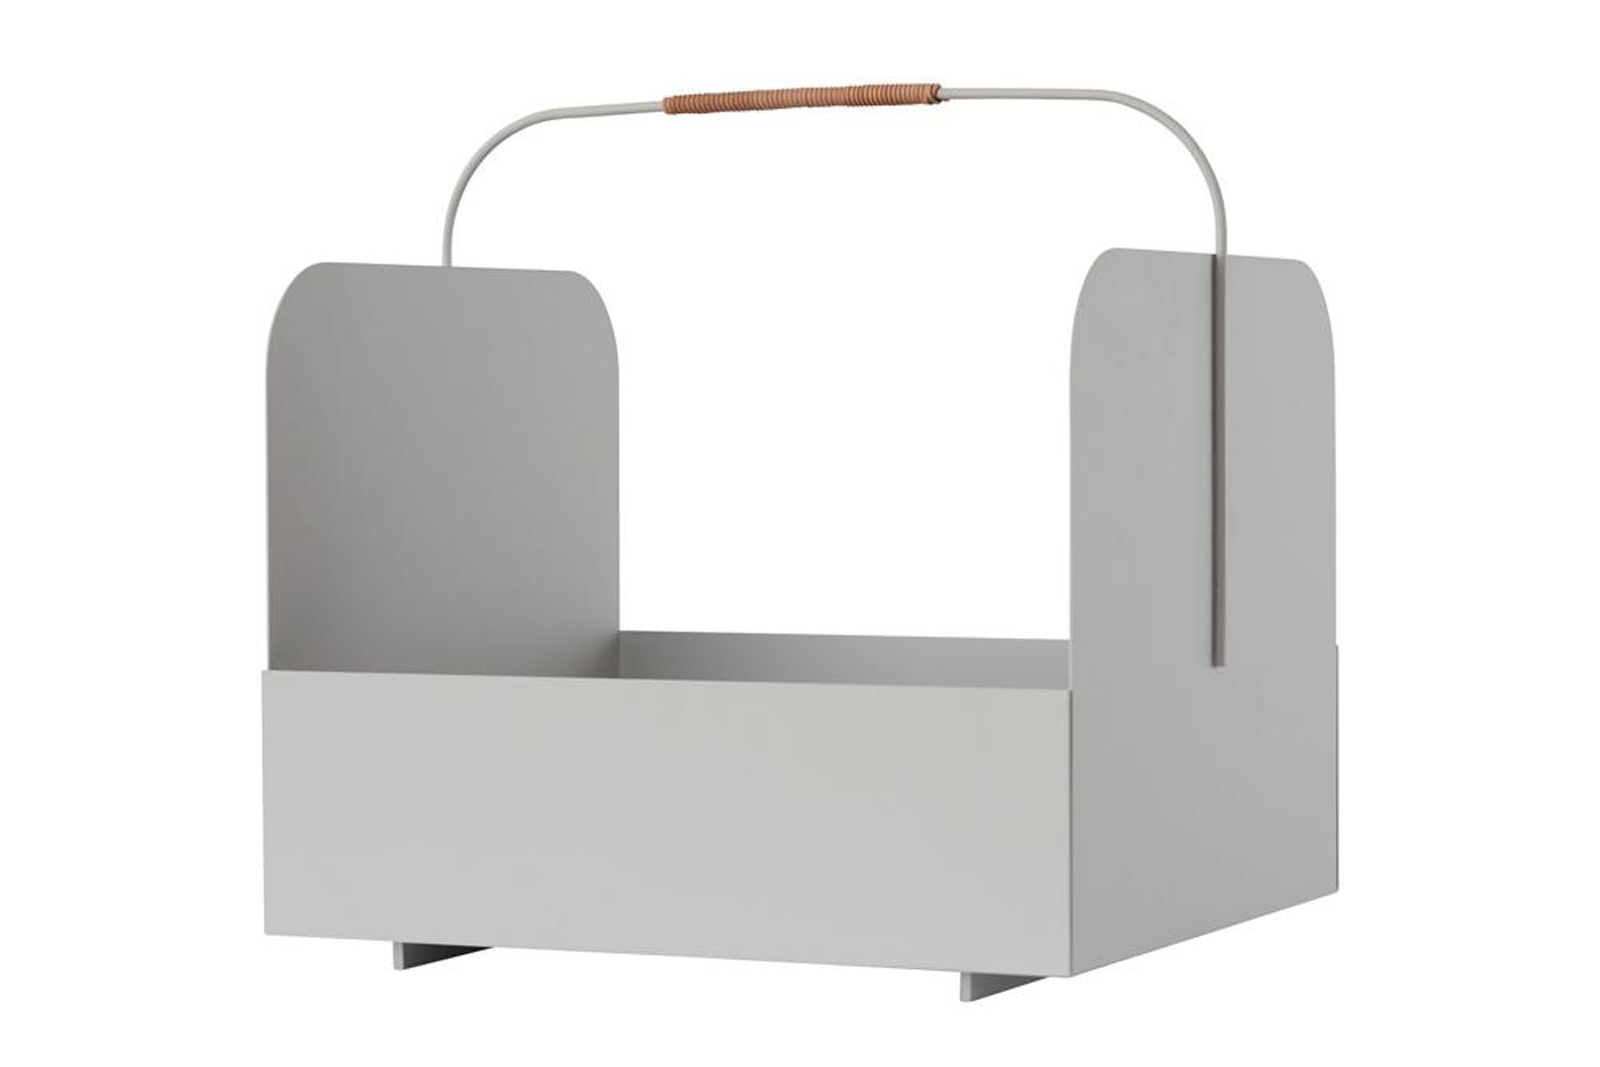 OYOY Living Design クリーンなデザインの多機能バスケット Maki Basket マガジンラック/プランター